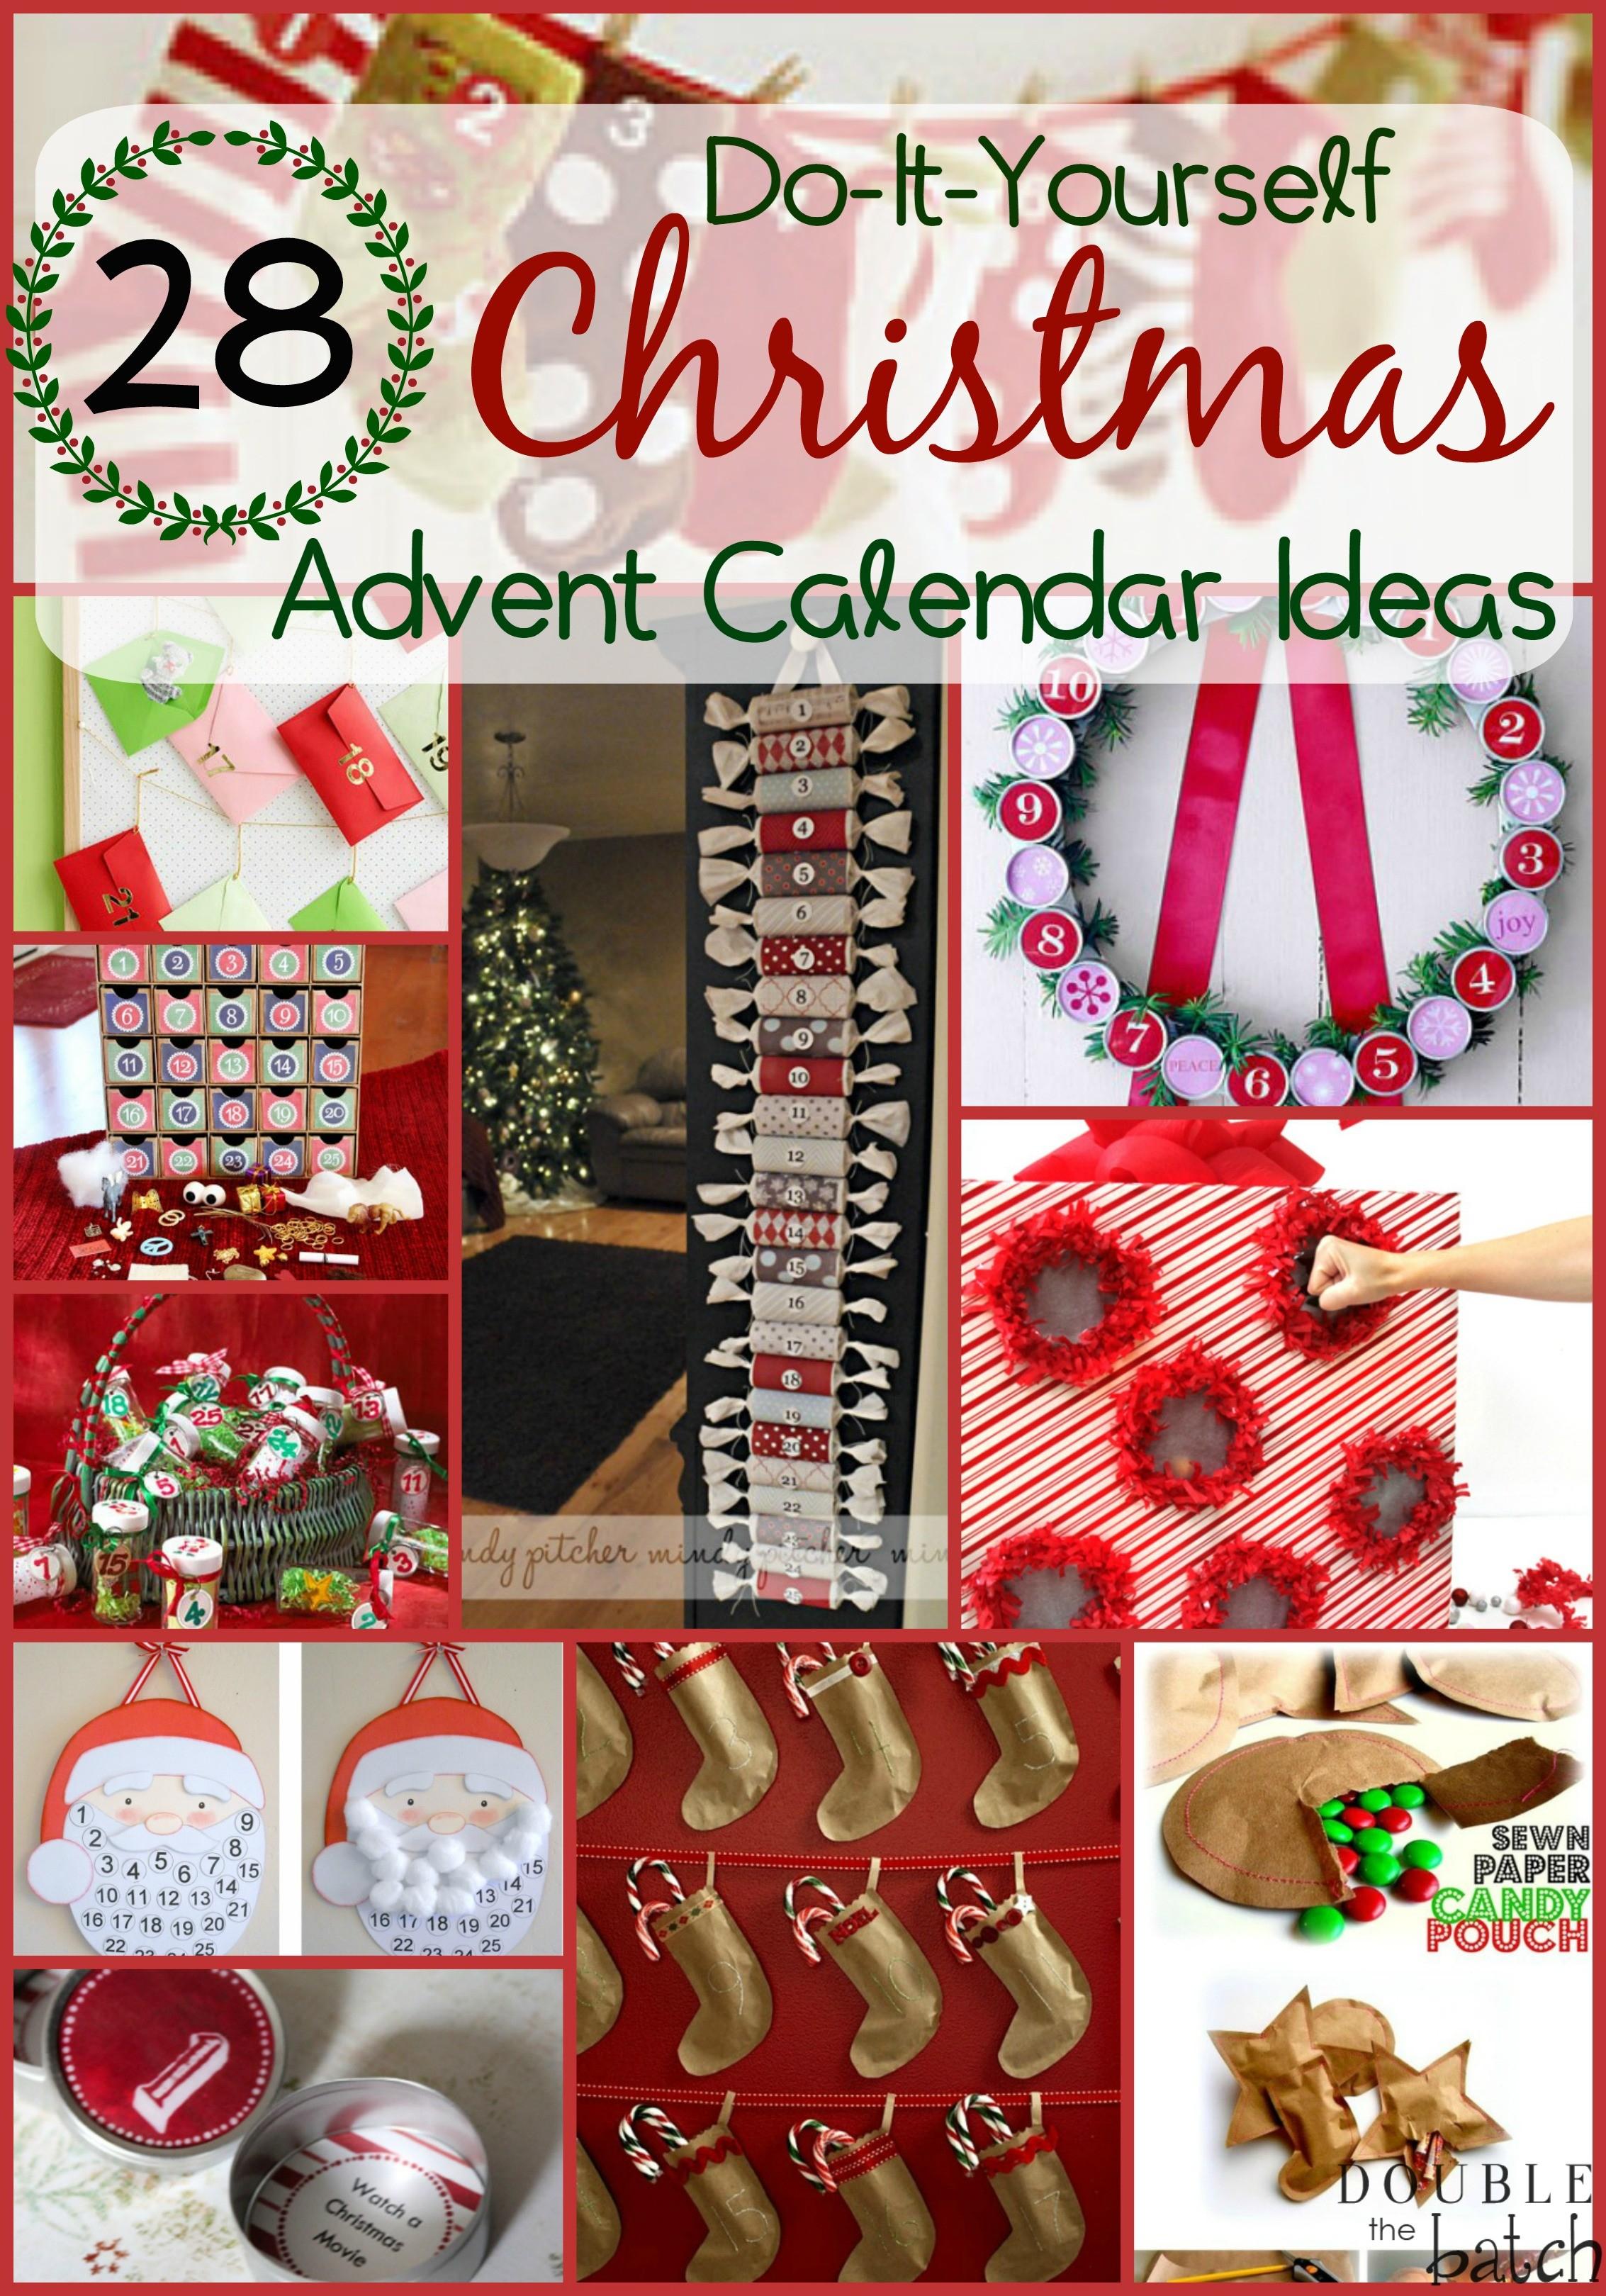 Diy Christmas Advent Calendar Ideas - Decoratorist - #156661